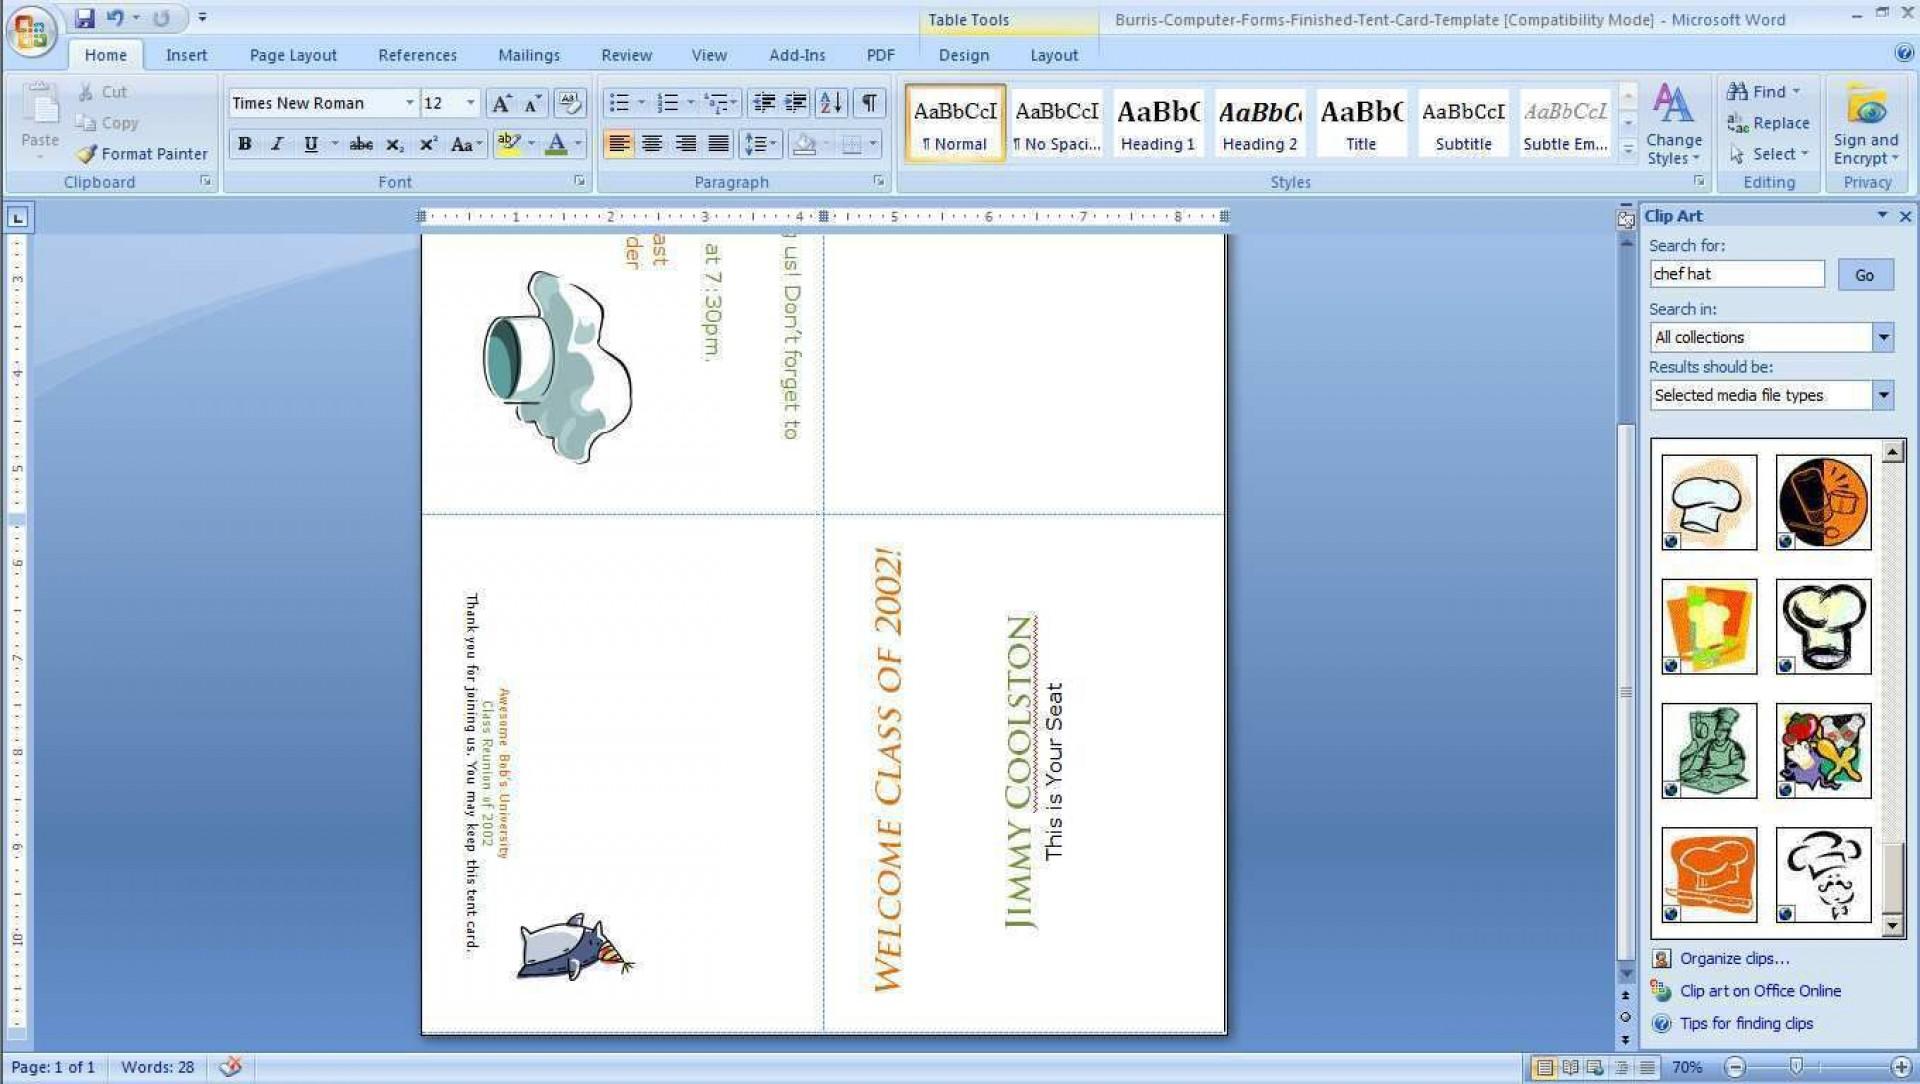 001 Breathtaking Microsoft Word Card Template Sample  Birthday Download Busines Free1920